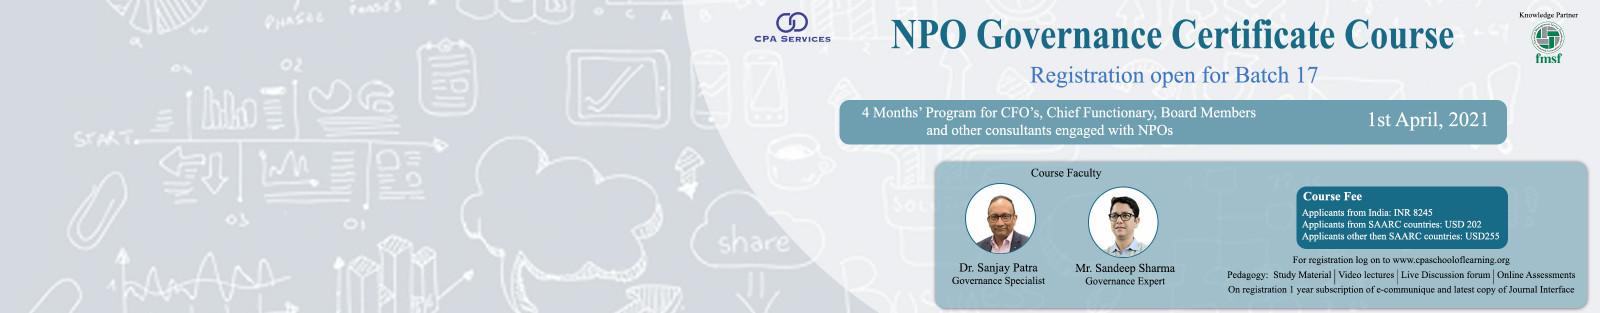 NPO Governance Program